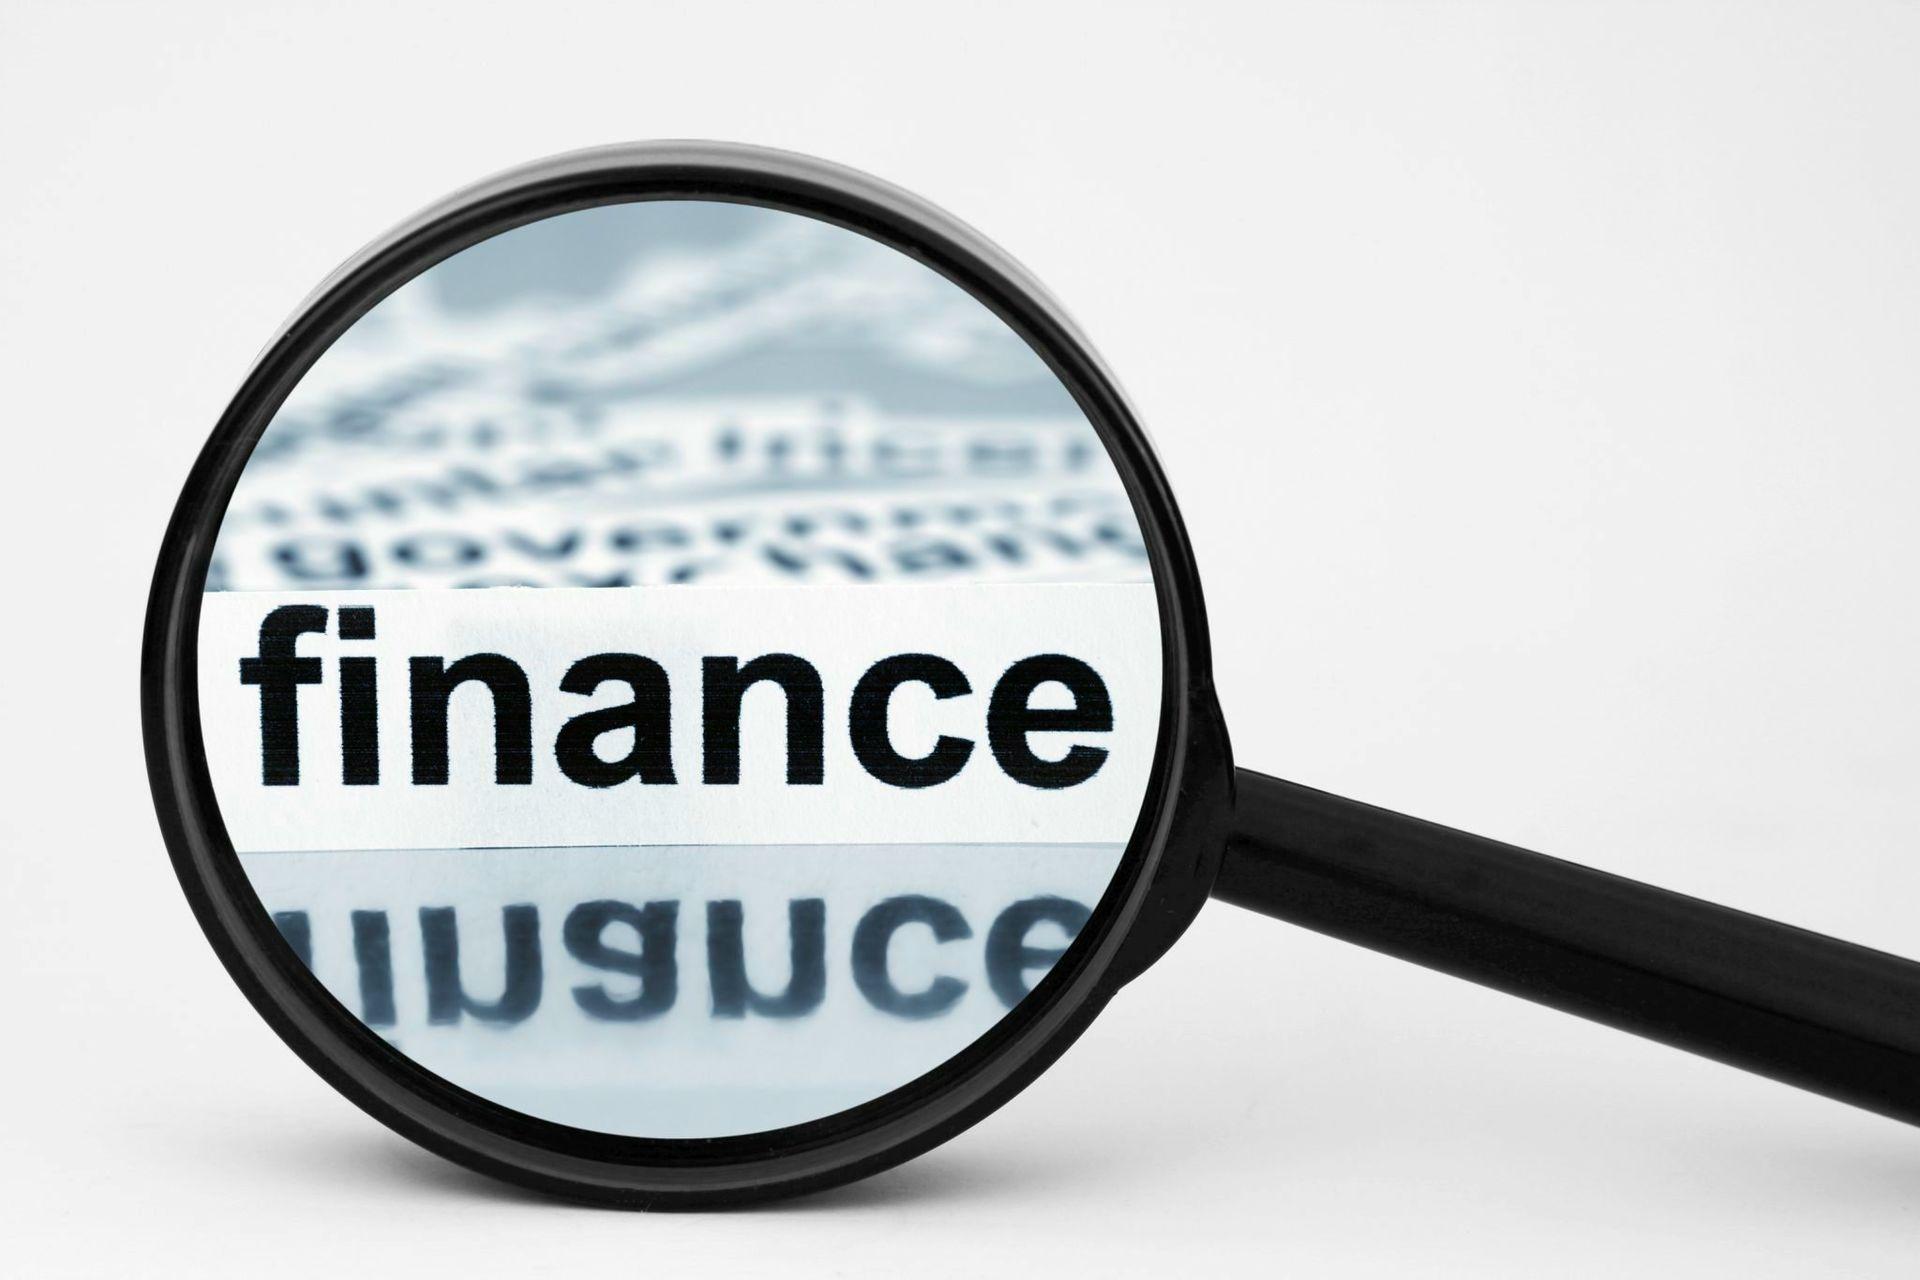 photodune-914413-finance-l-6-2-finance